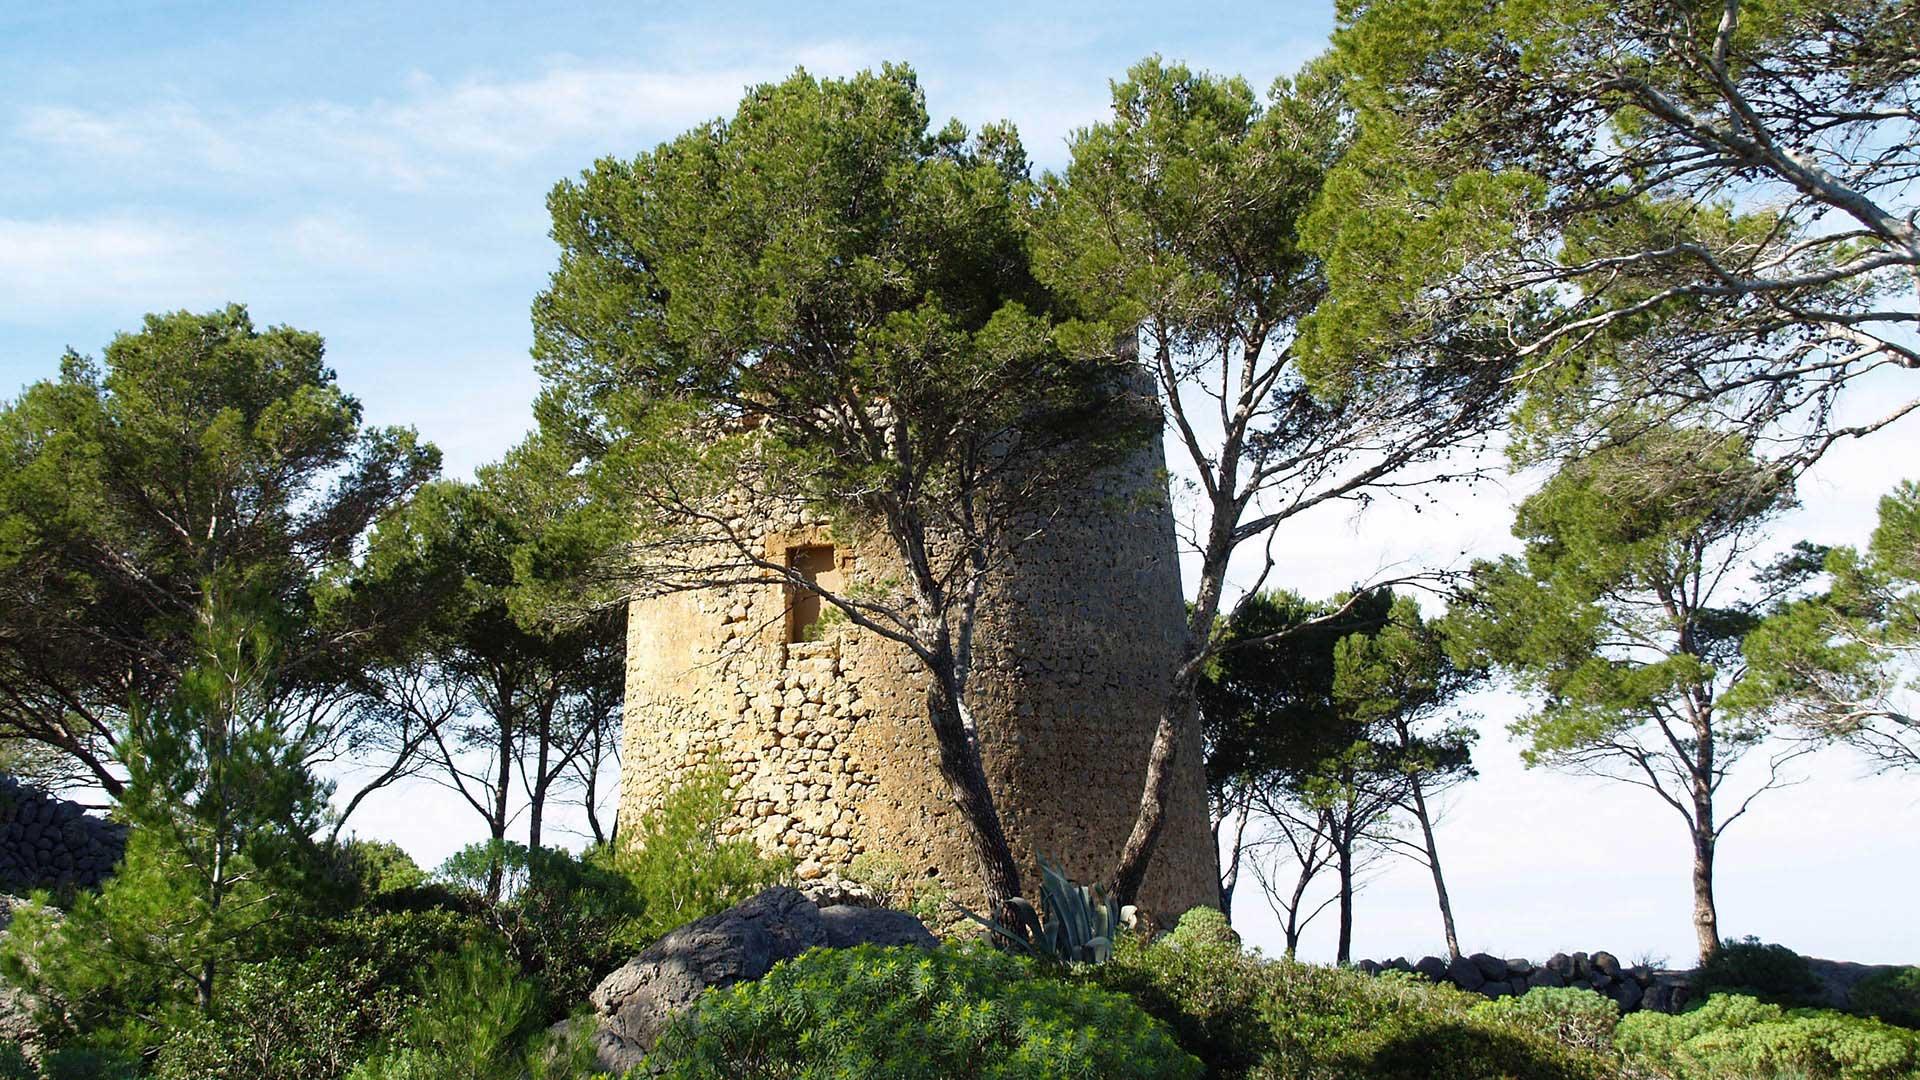 Imagen Tower sa Pedrissa